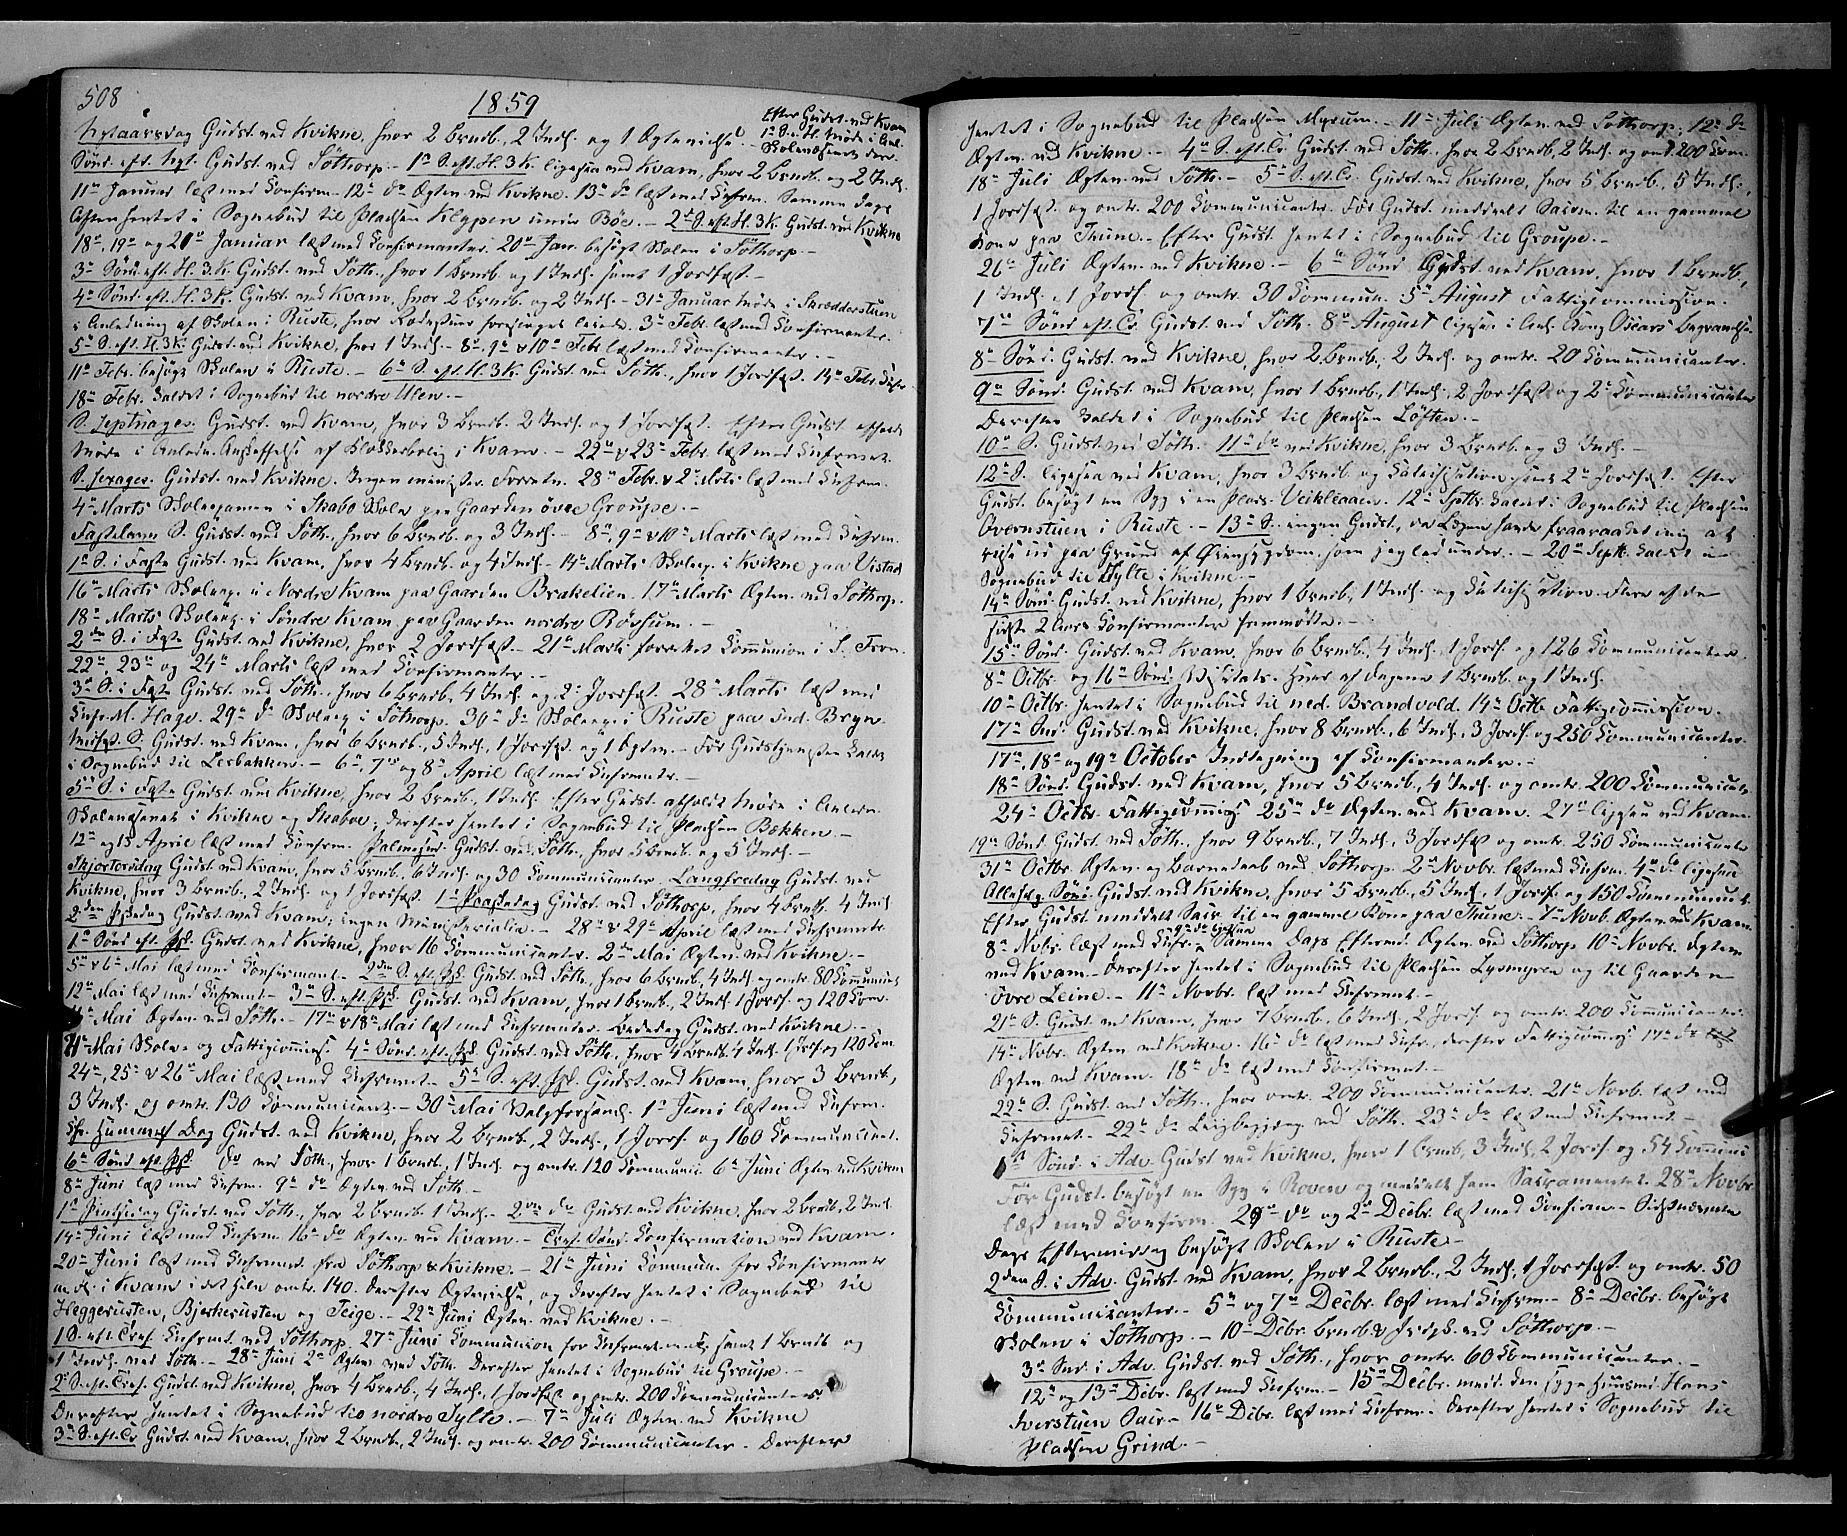 SAH, Nord-Fron prestekontor, Ministerialbok nr. 1, 1851-1864, s. 508